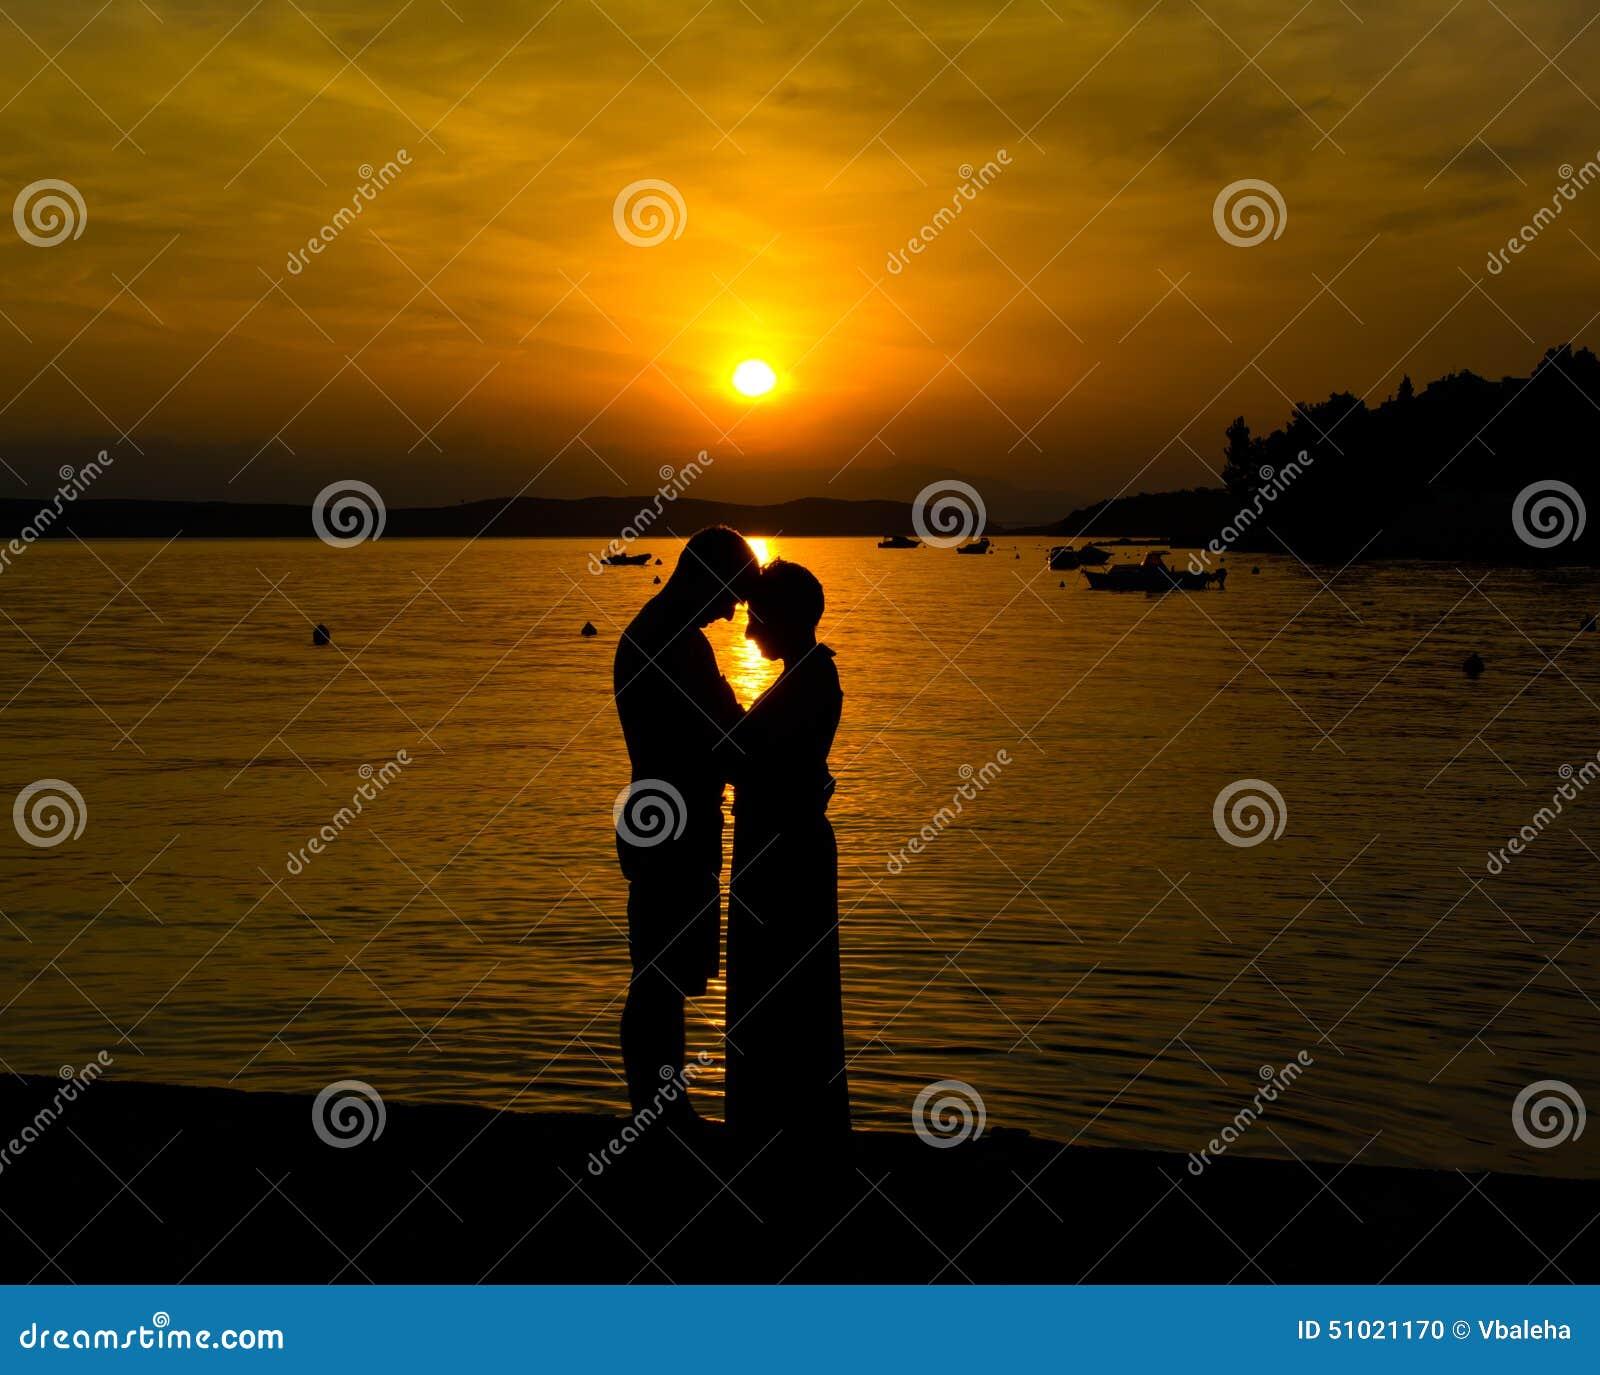 Couple In Love Enjoying Romantic Evening Stock Photo